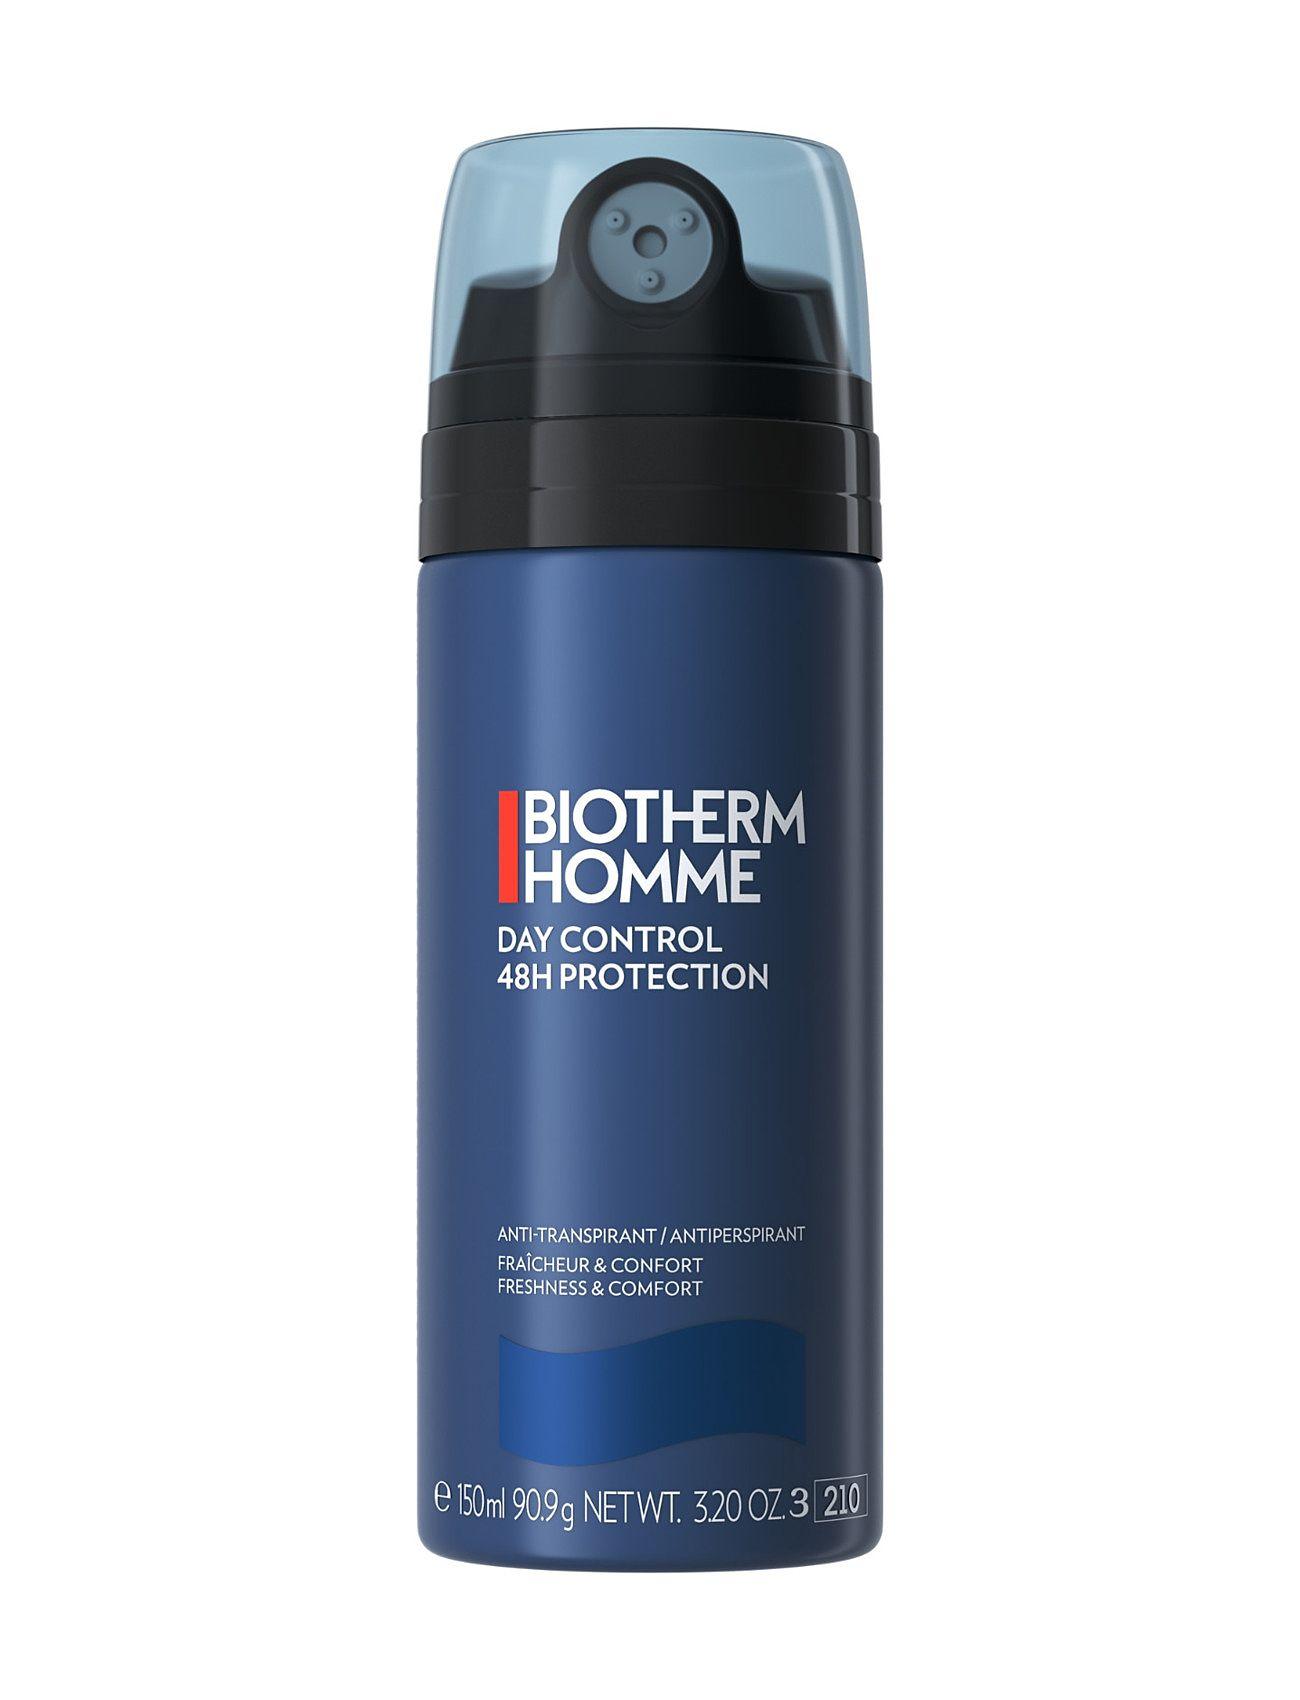 Biotherm Day Control Deo Spray 150 ml - CLEAR